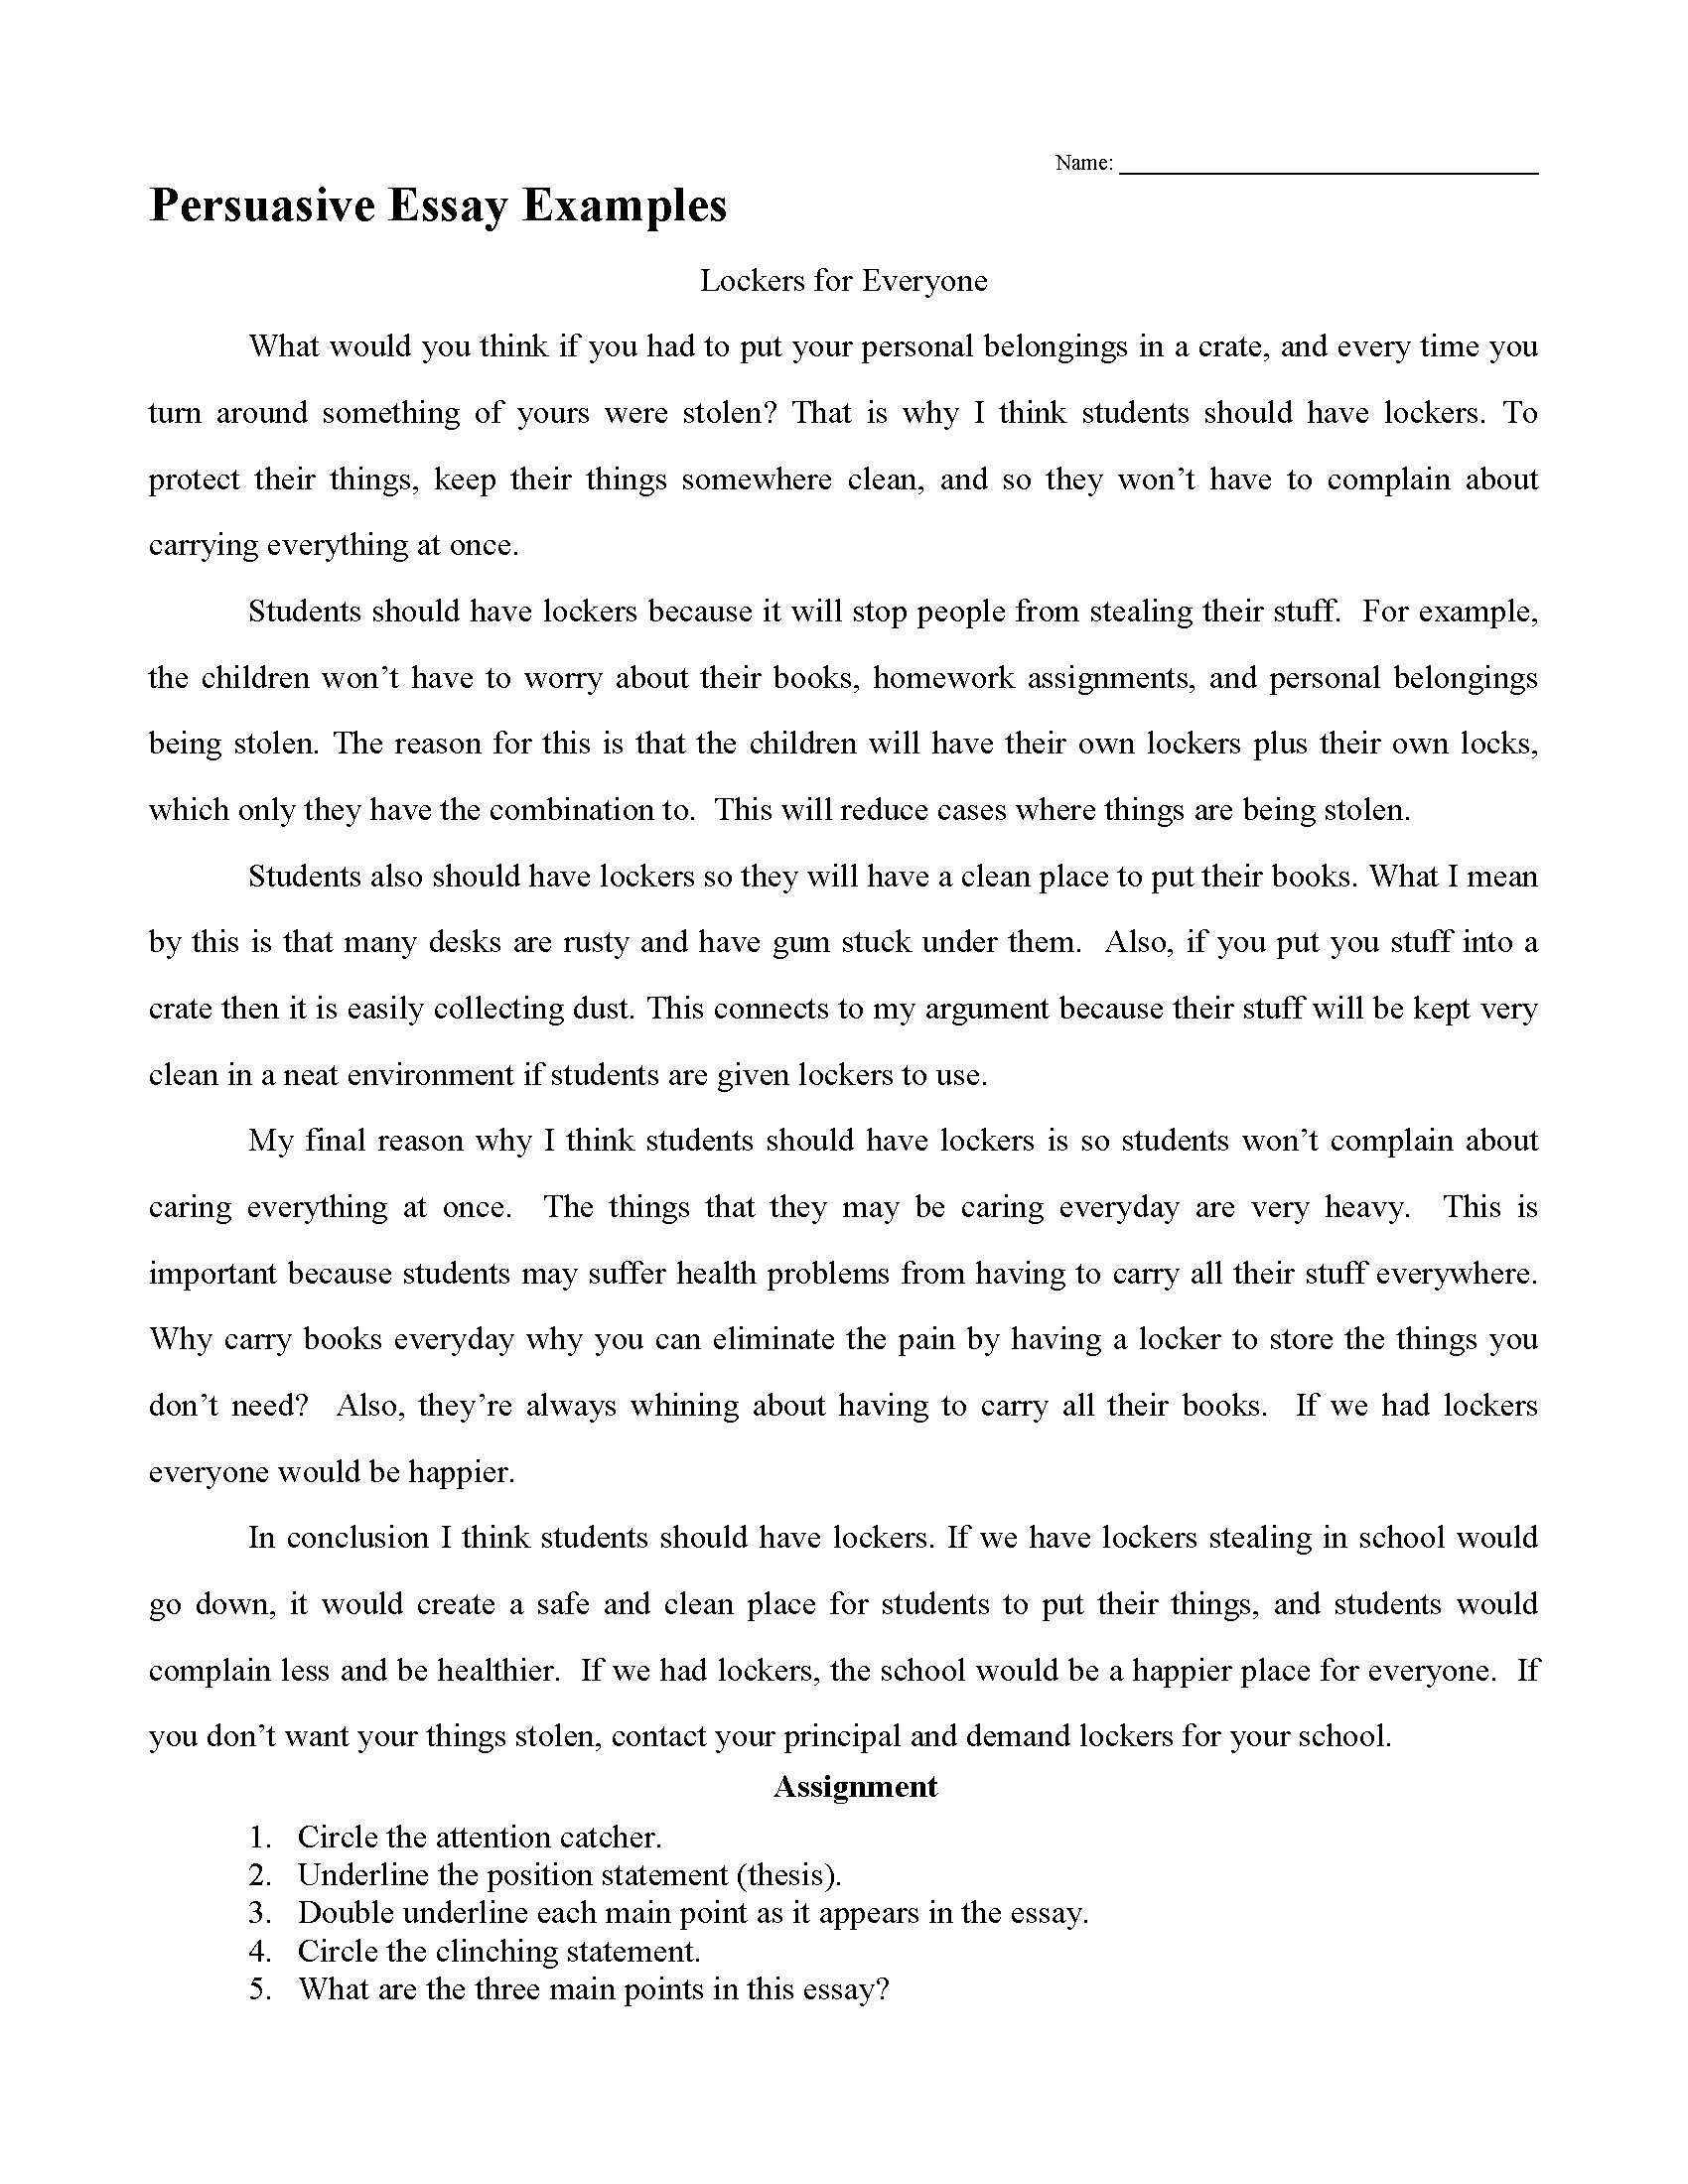 Examples On Persuasive Essays